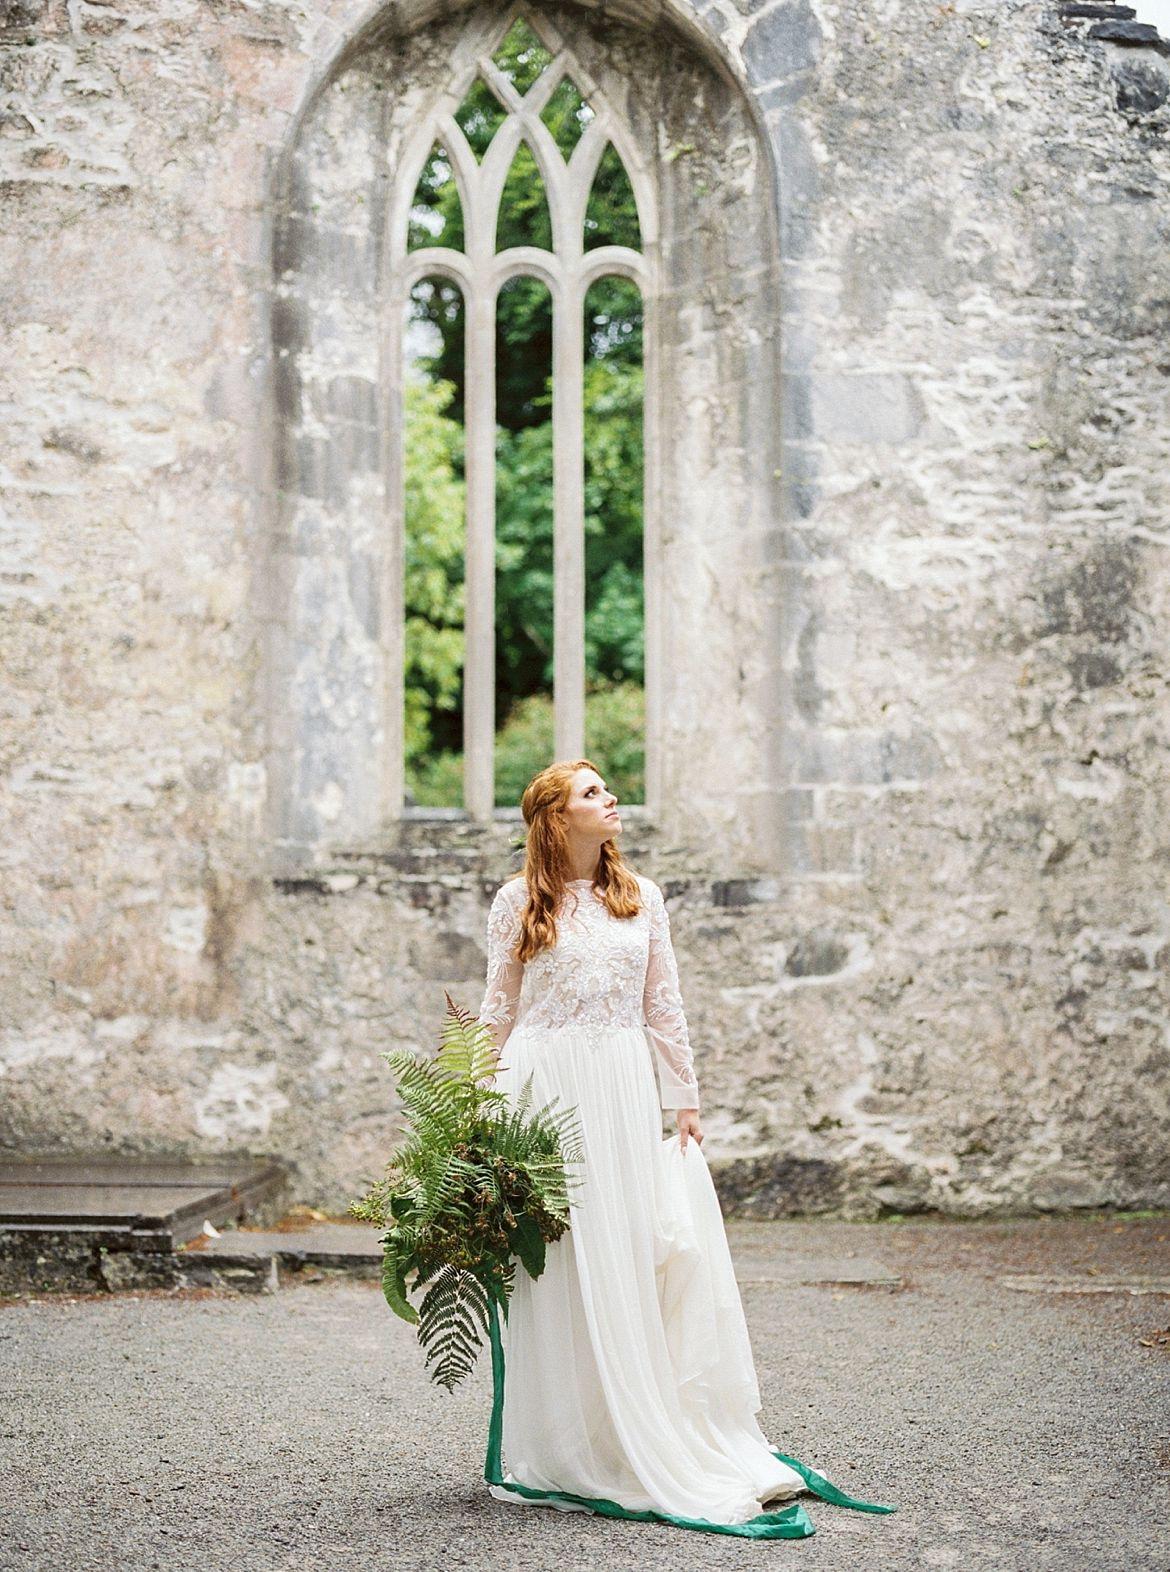 Best Fine Art Wedding Ideas